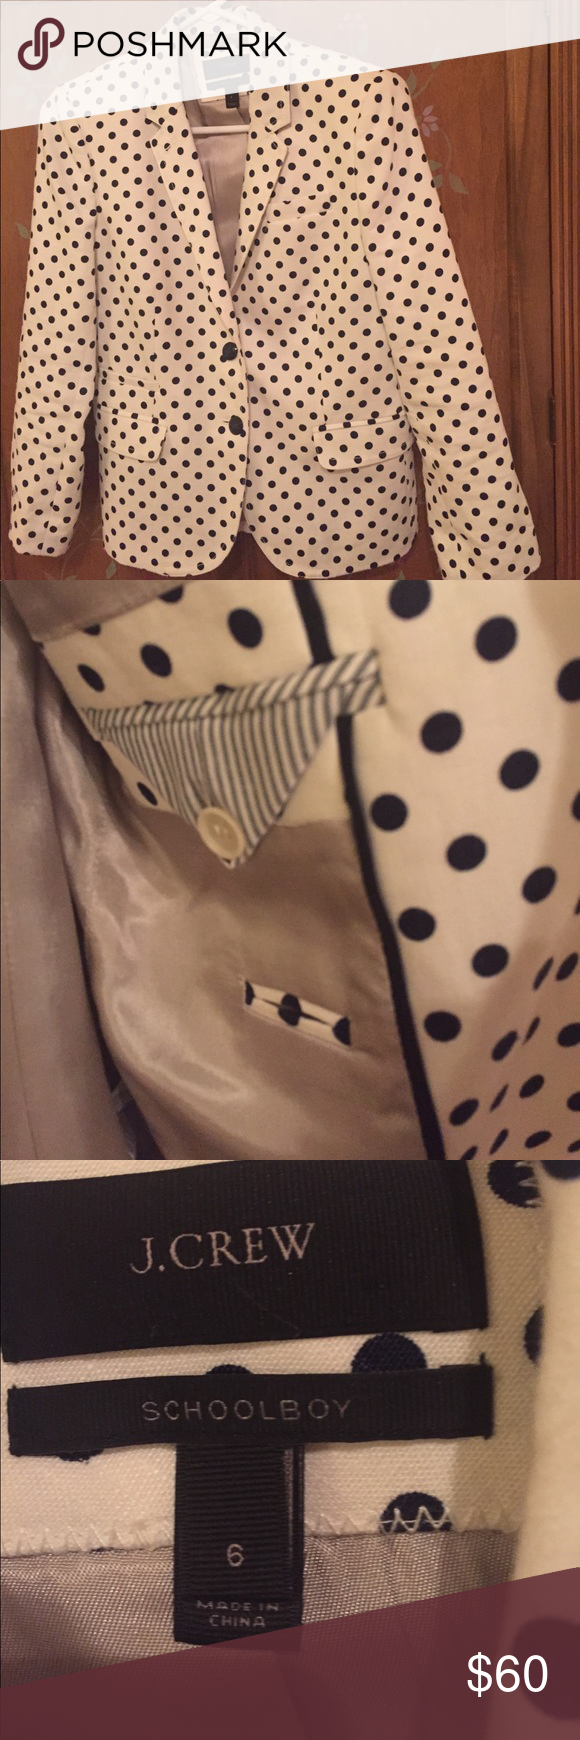 J crew school boy blazer Navy and white linen blazer. Very well made. Inside lipstick pocket.  This blazer was worn once. It's very crisp and clean. J. Crew Jackets & Coats Blazers